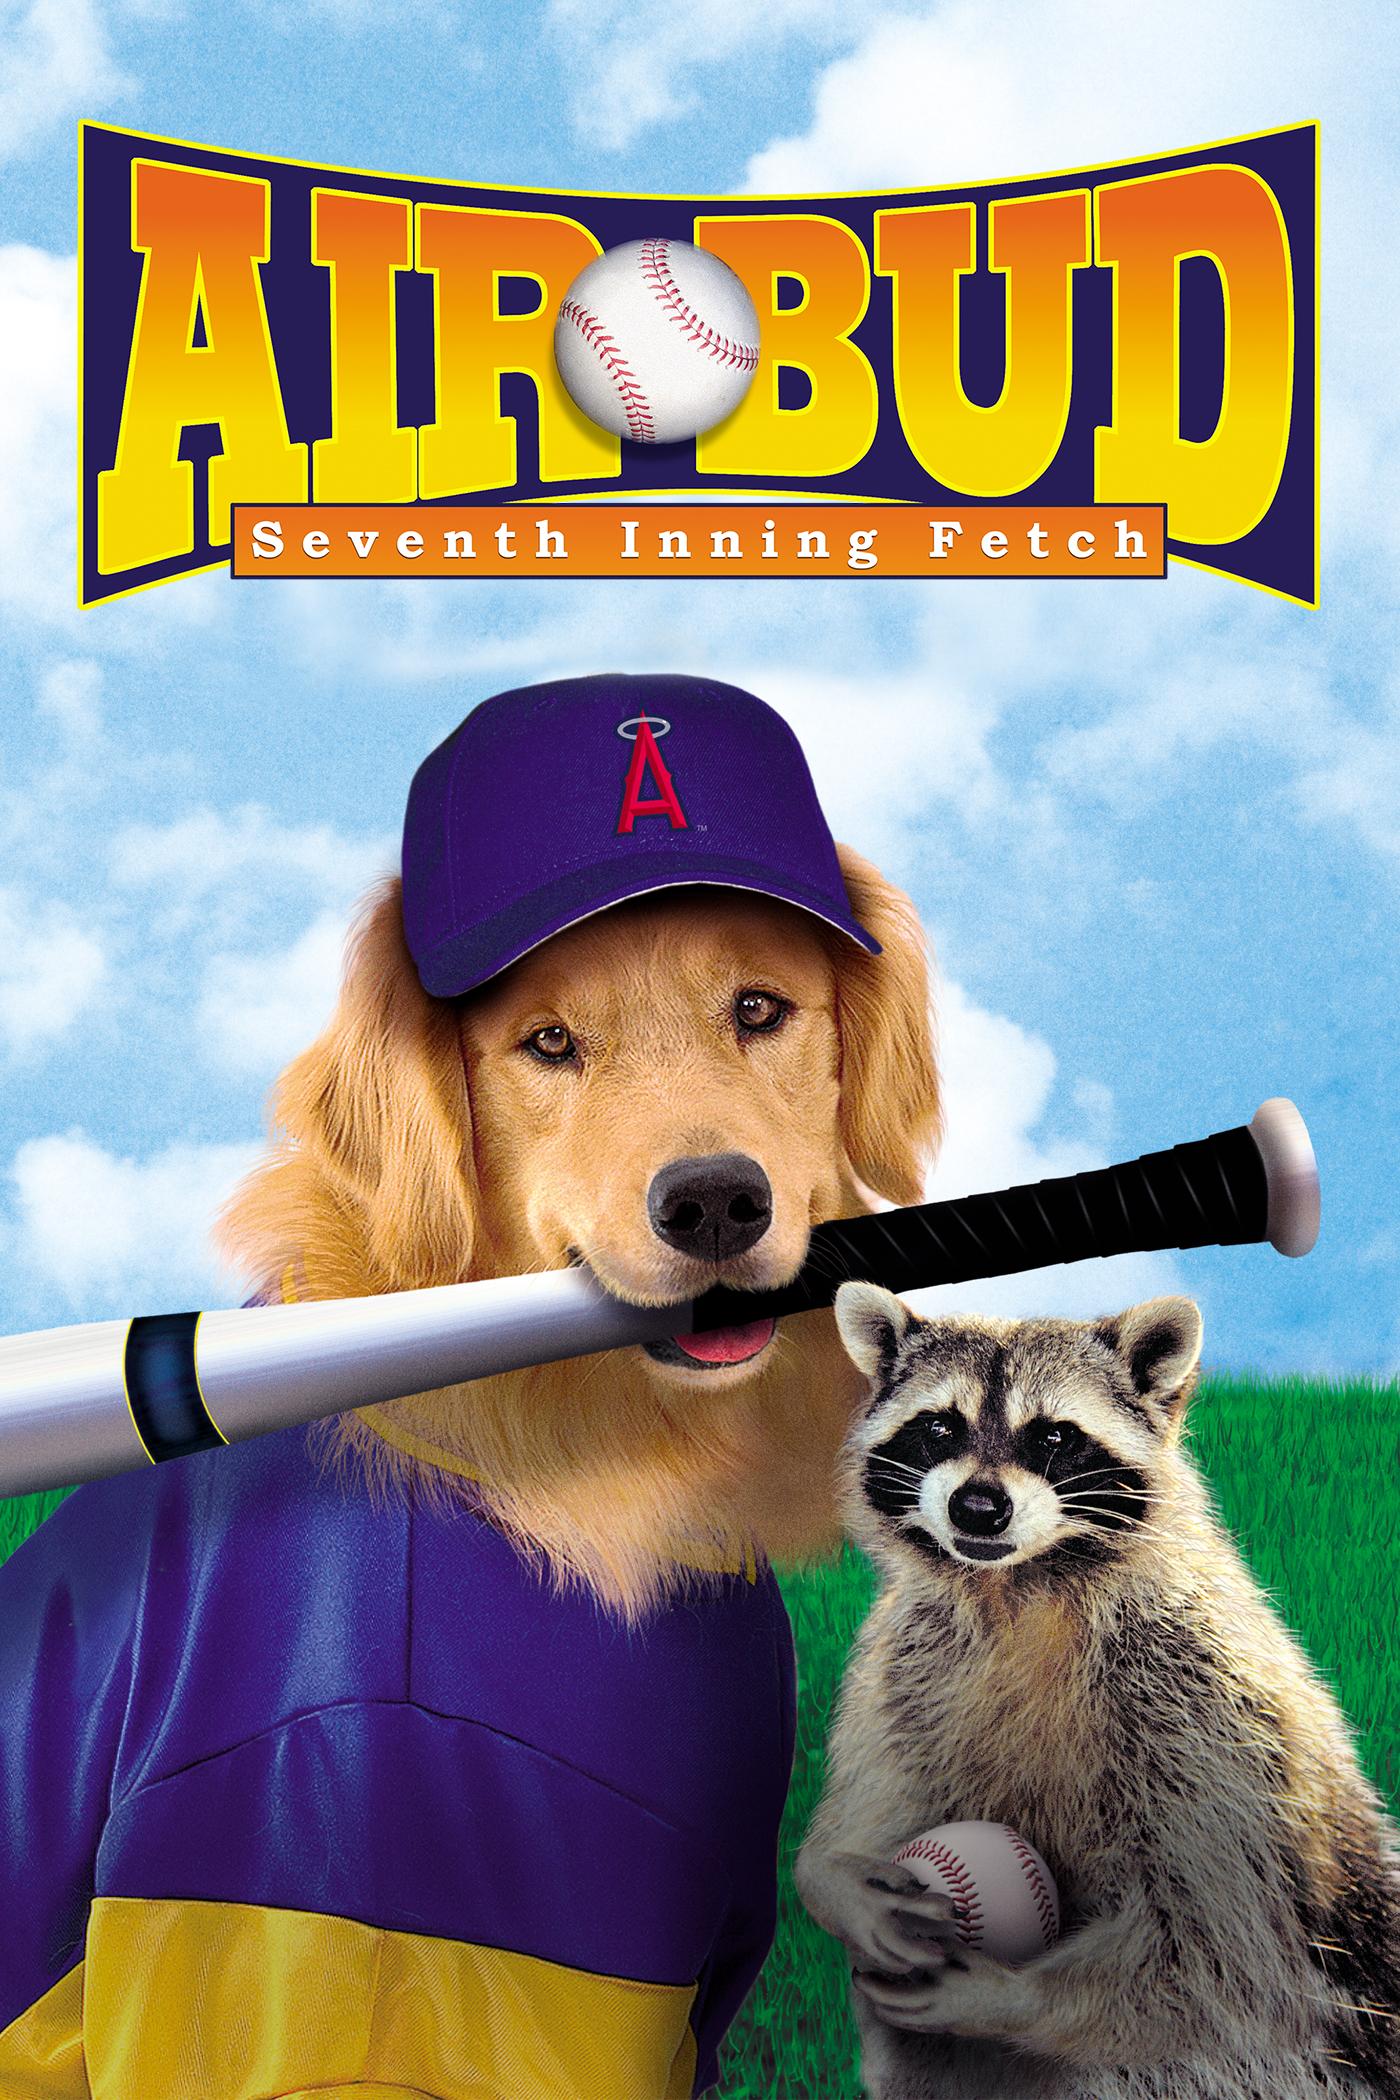 air bud seventh inning fetch full movie free